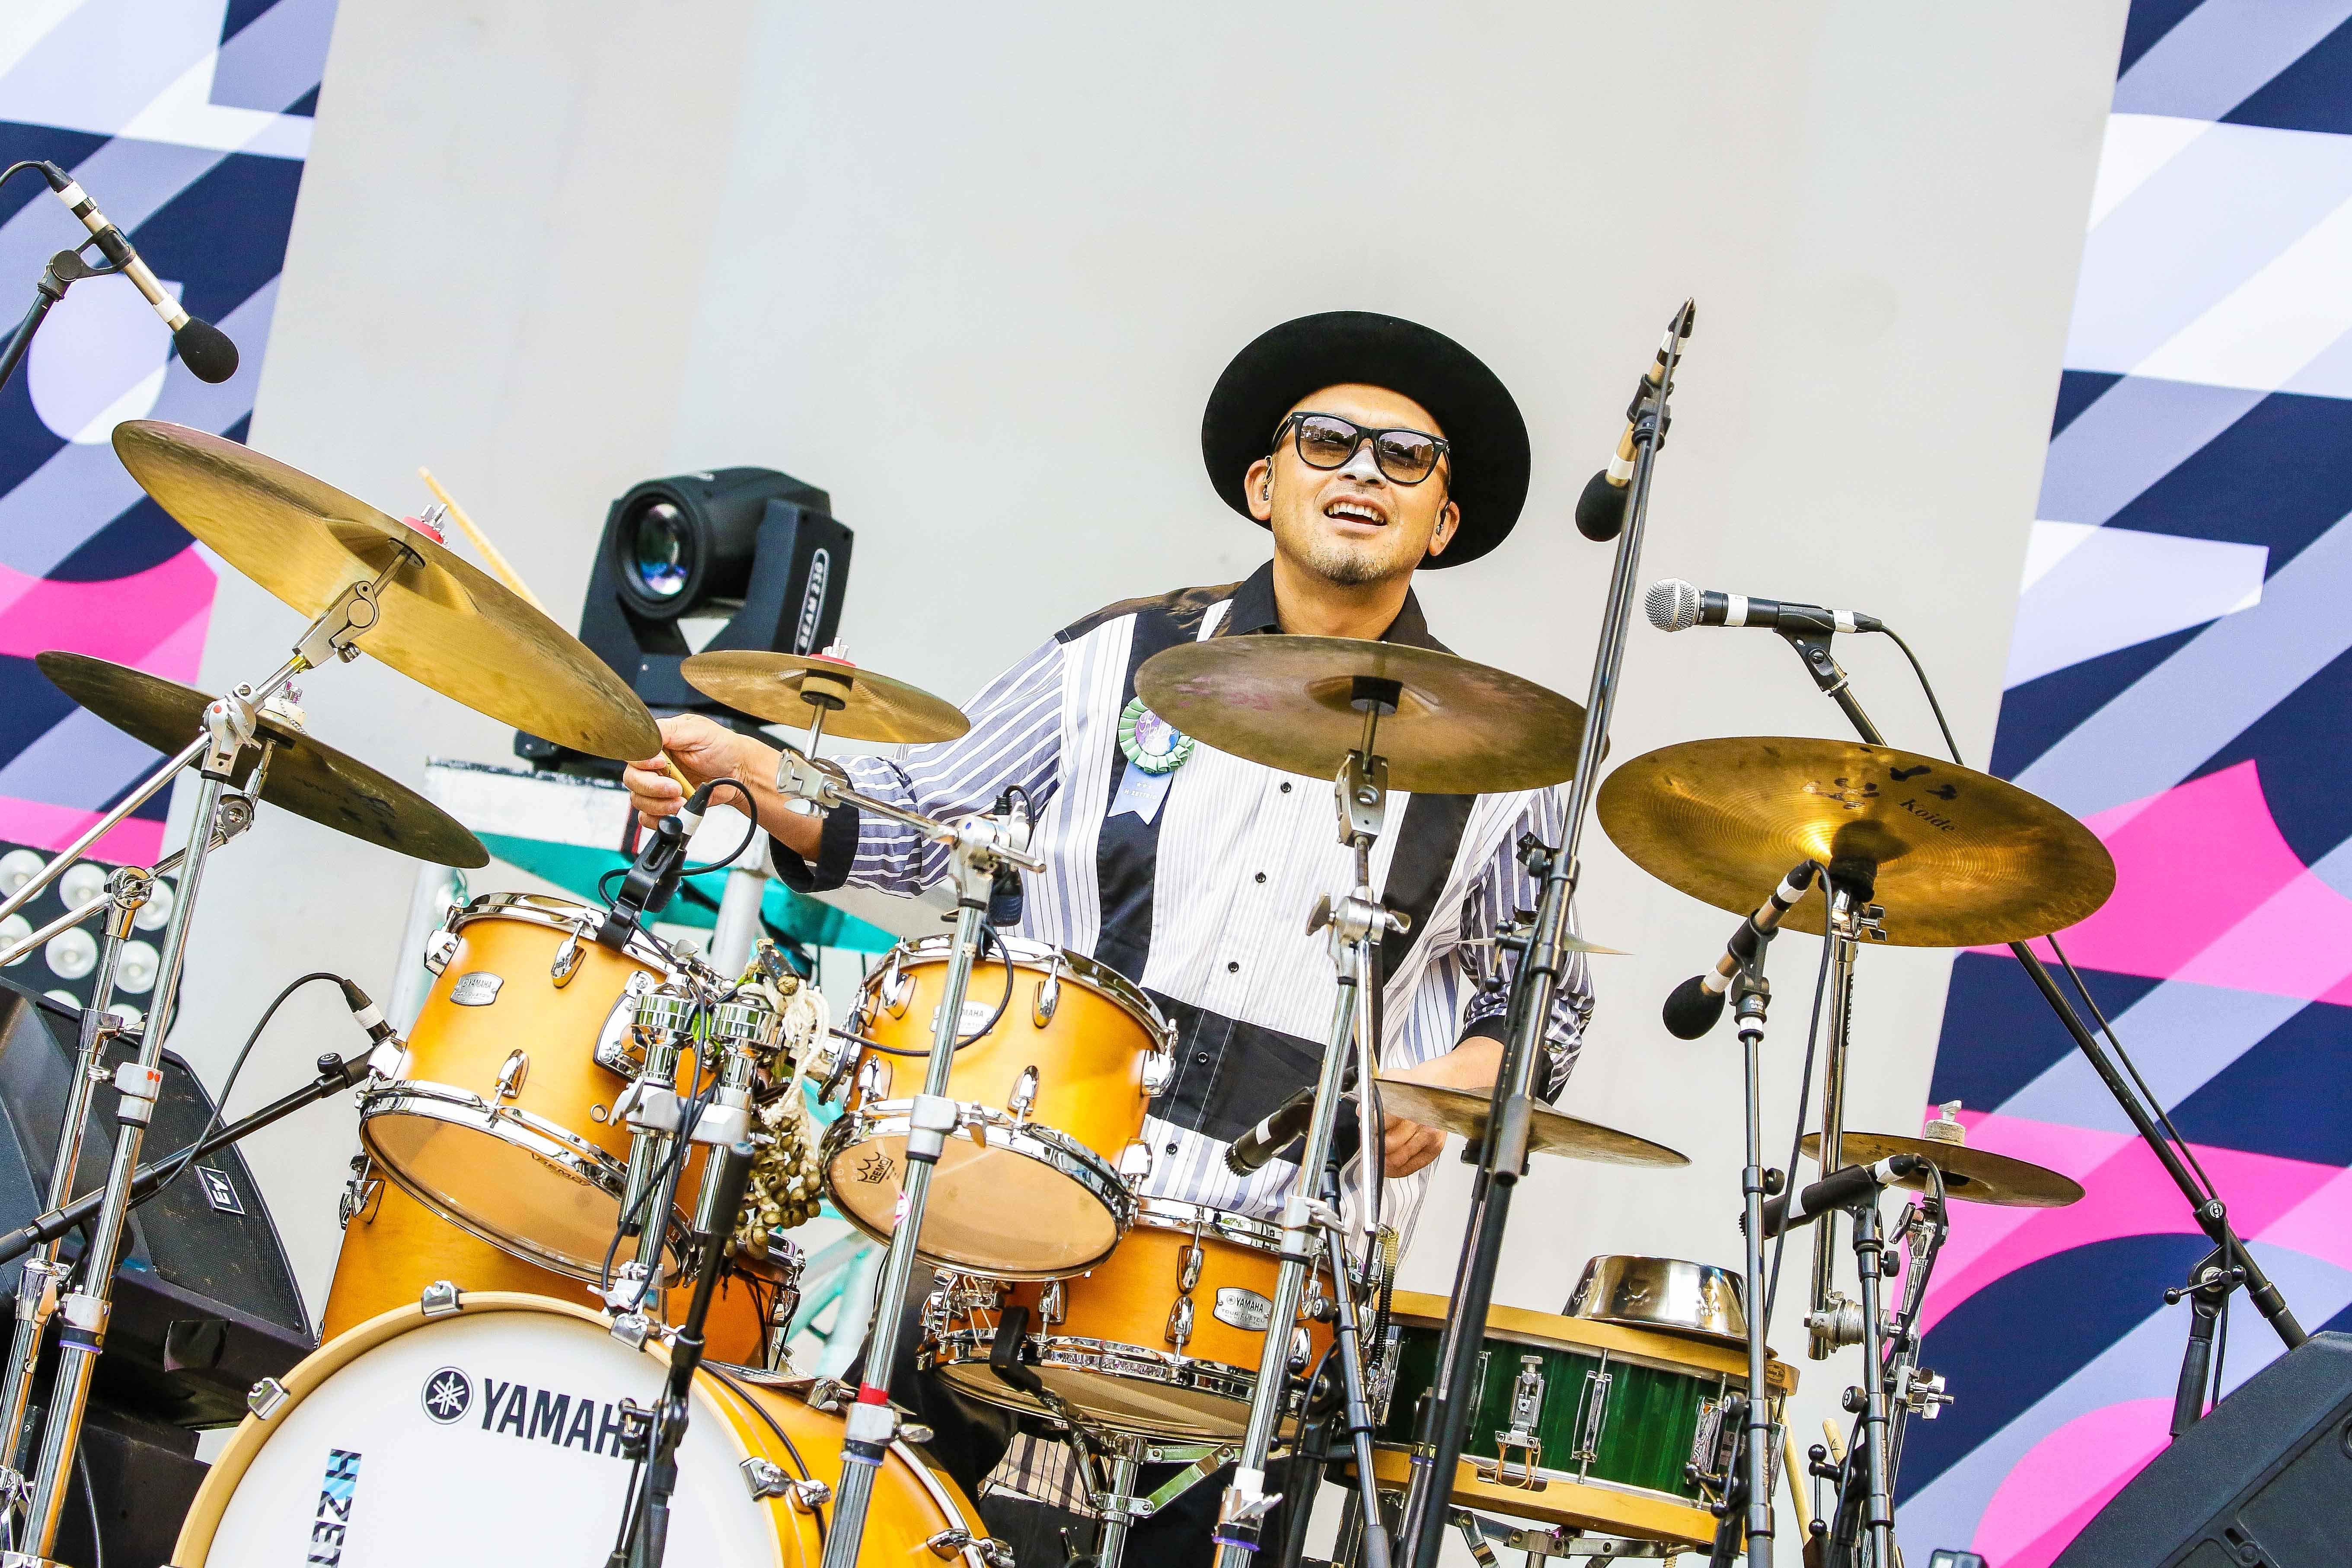 H ZETTRIO こどもの日スペシャル in 大阪野音 -Virtual World (Jazz)-